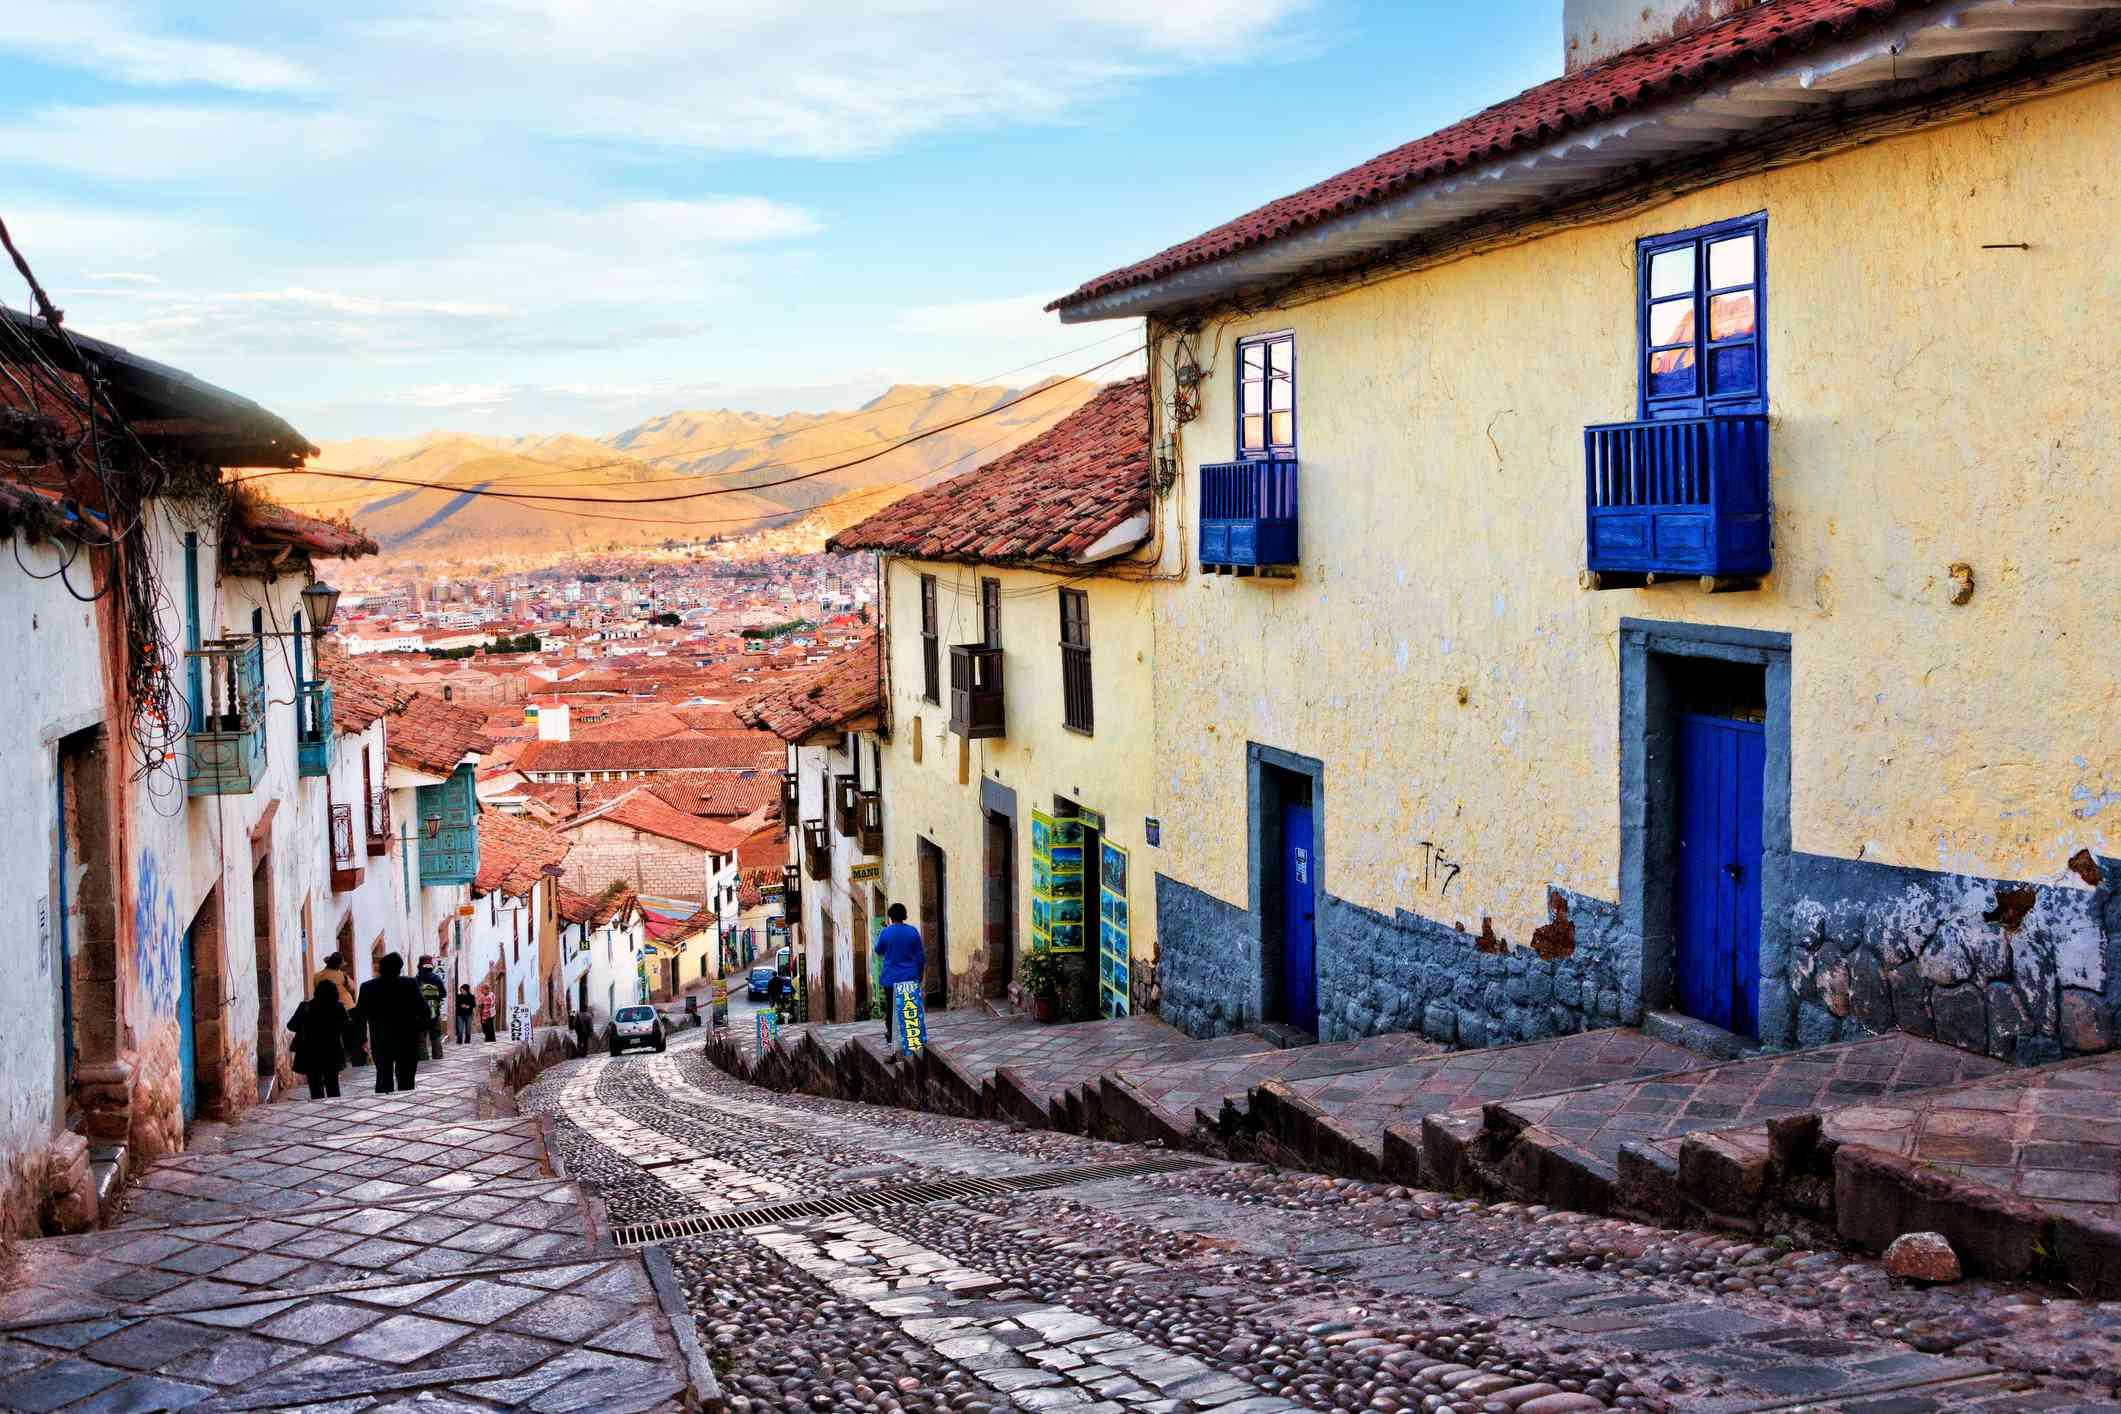 Historic architecture of Cusco along steep street northwest of Plaza de Armas, Peru